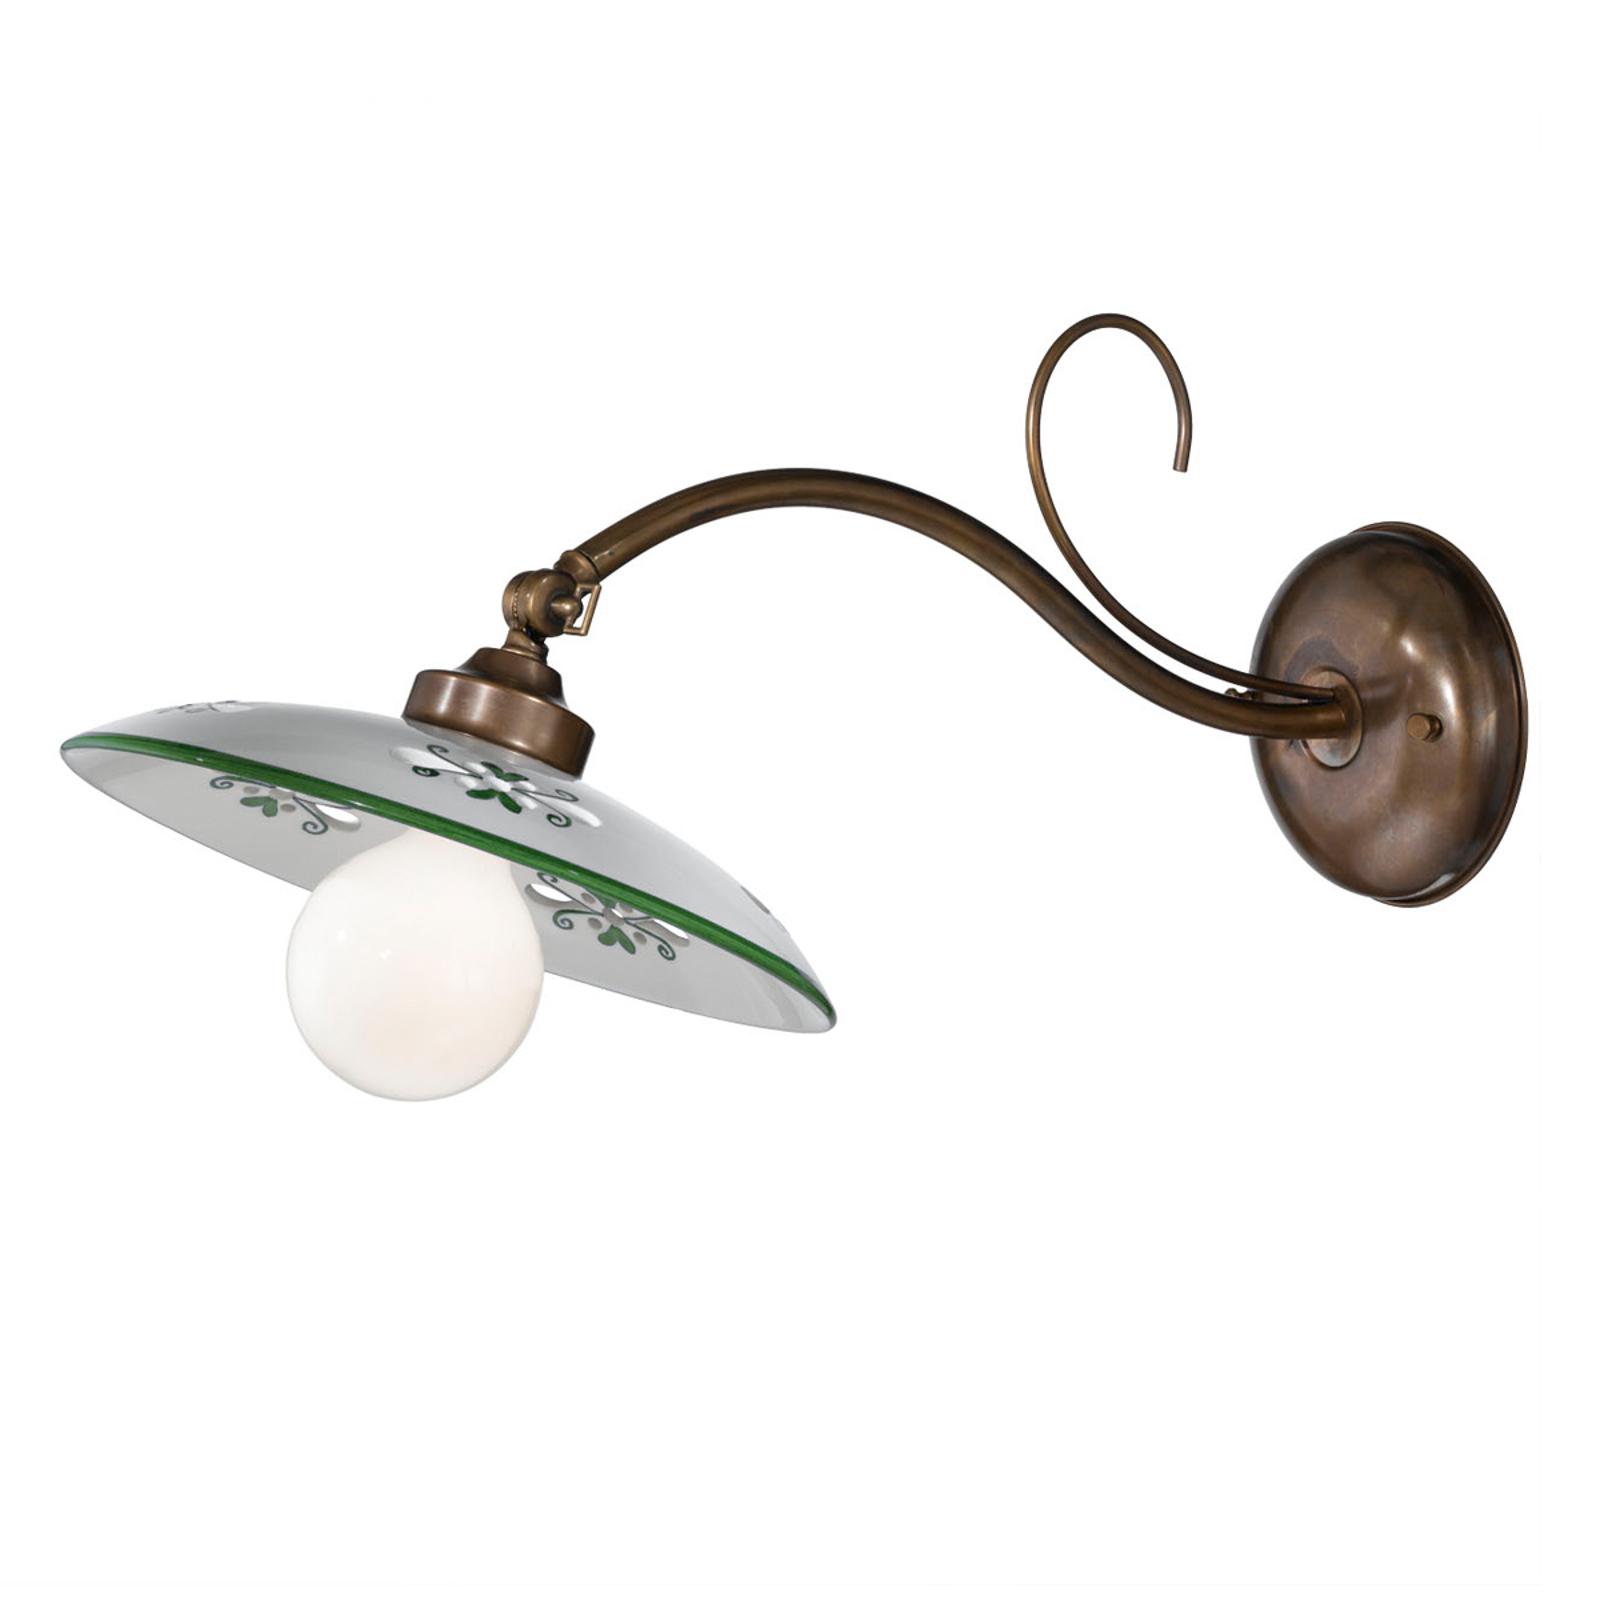 Wandlamp Bassano keramieken kap groen